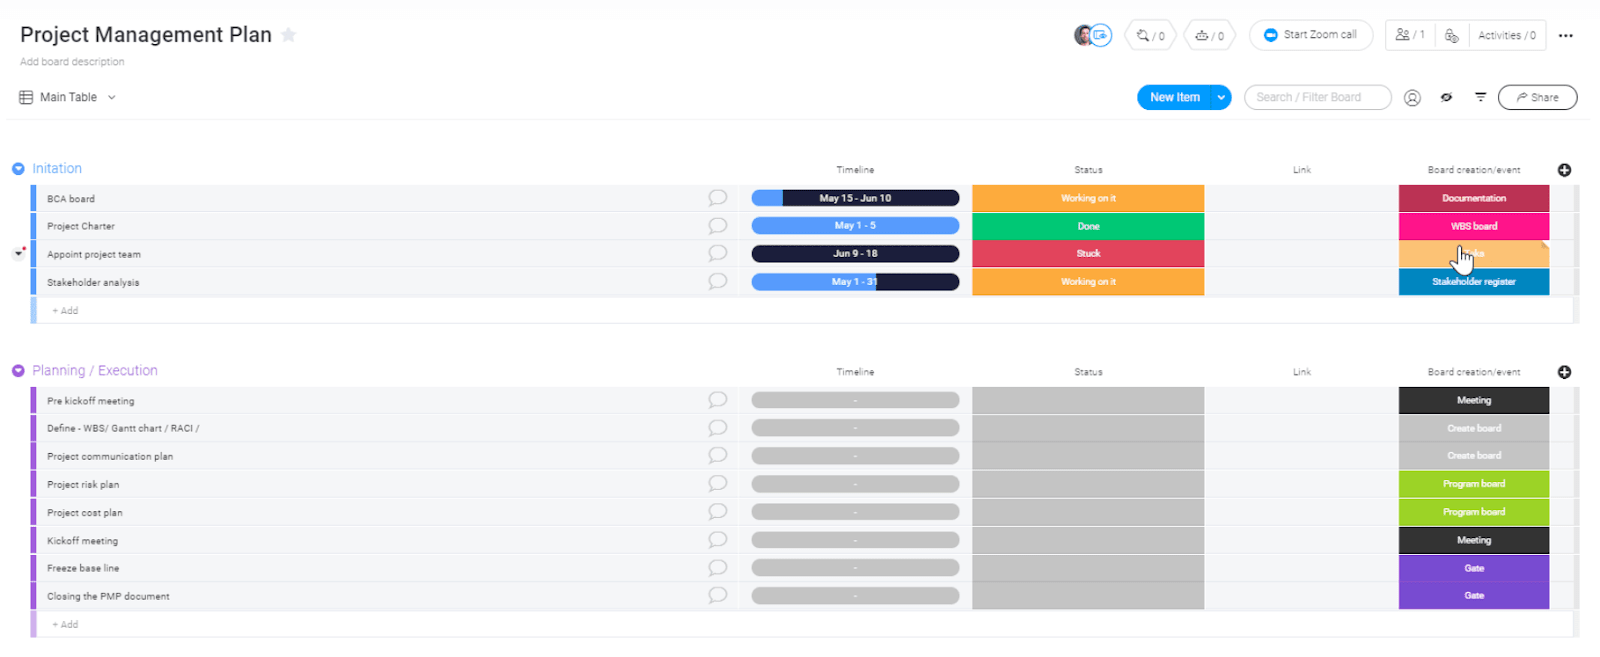 monday.com project management plan template